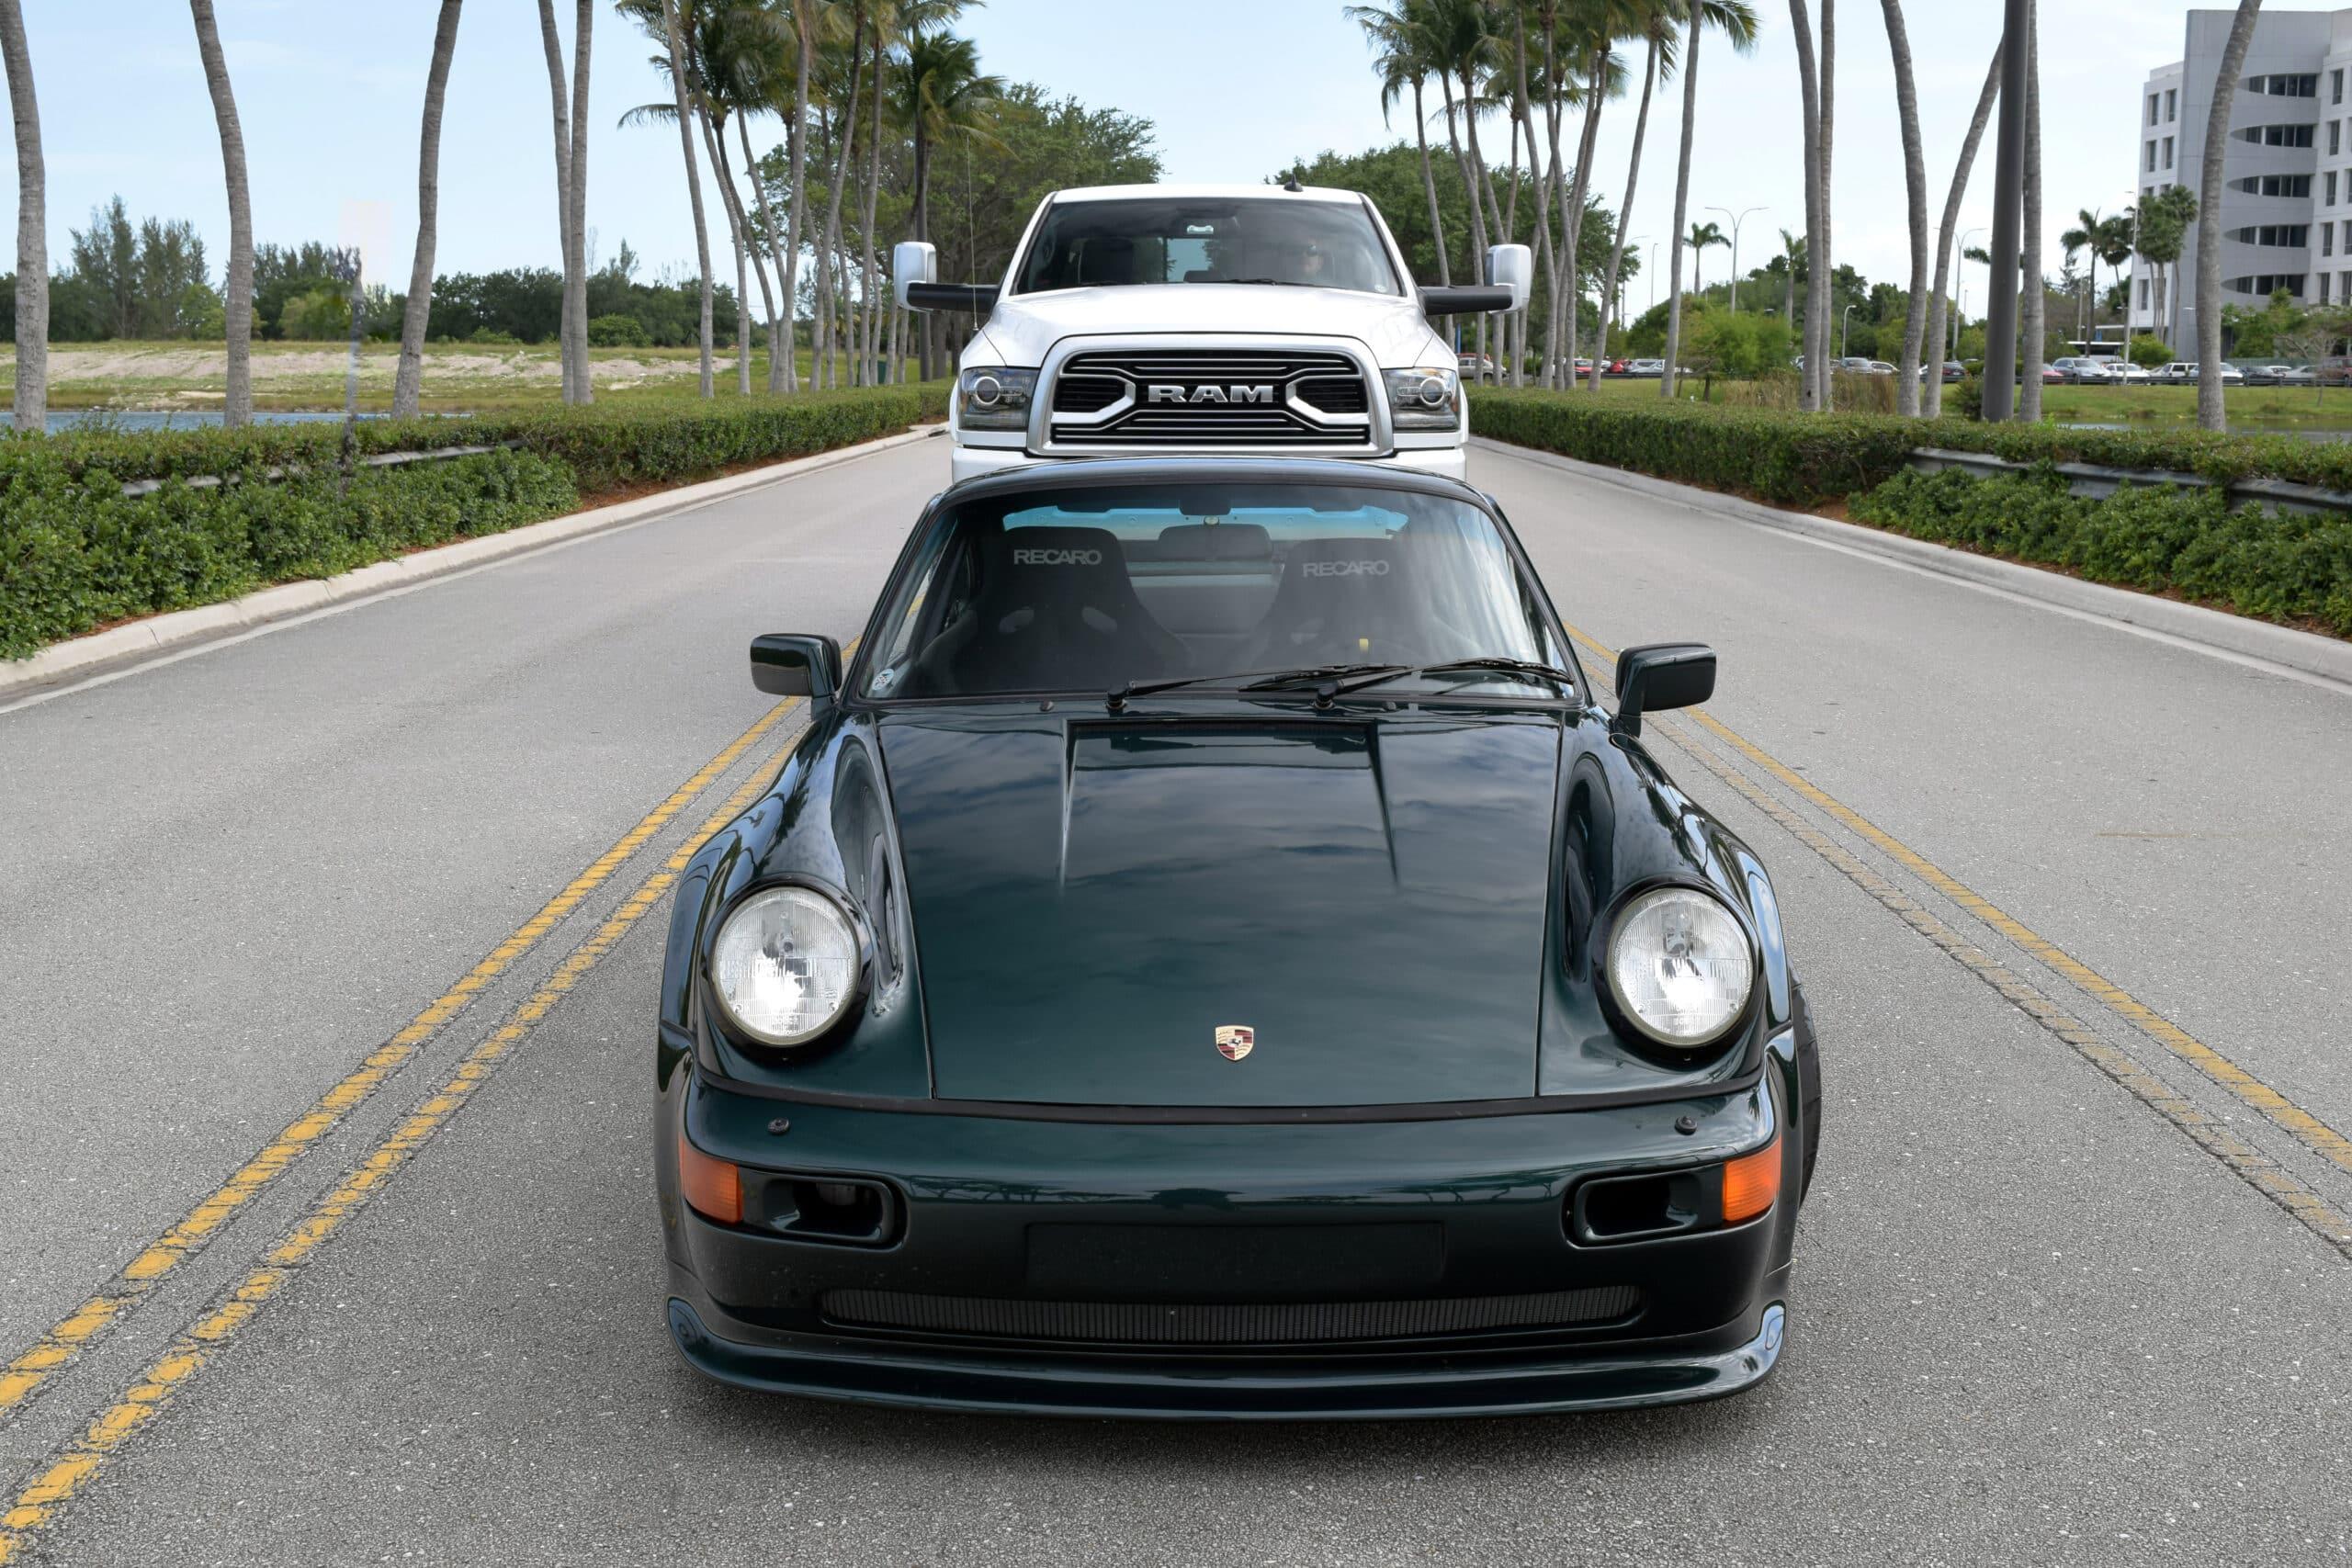 1990 Porsche 911 964 Carrera 4 Turbo $30k Split Case Rebuild – 3.3L Turbo – Widebody – OG Forest Green – Rotiforms